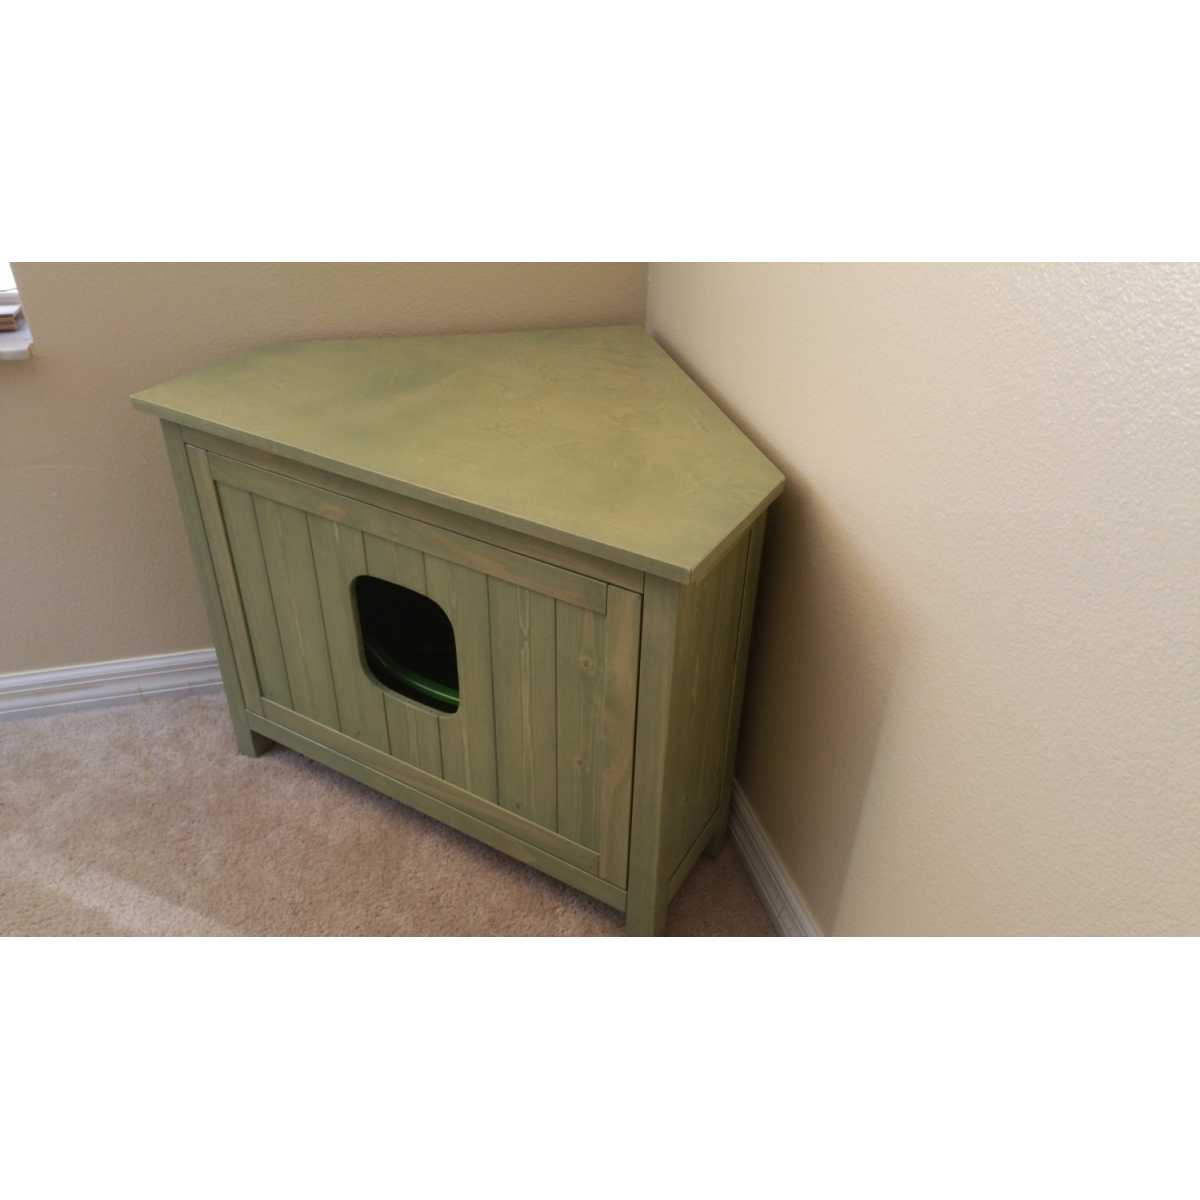 corner cat litter box furniture. Corner Cabinet Cat Litter Box Chest With Odor Absorbing Light Furniture I